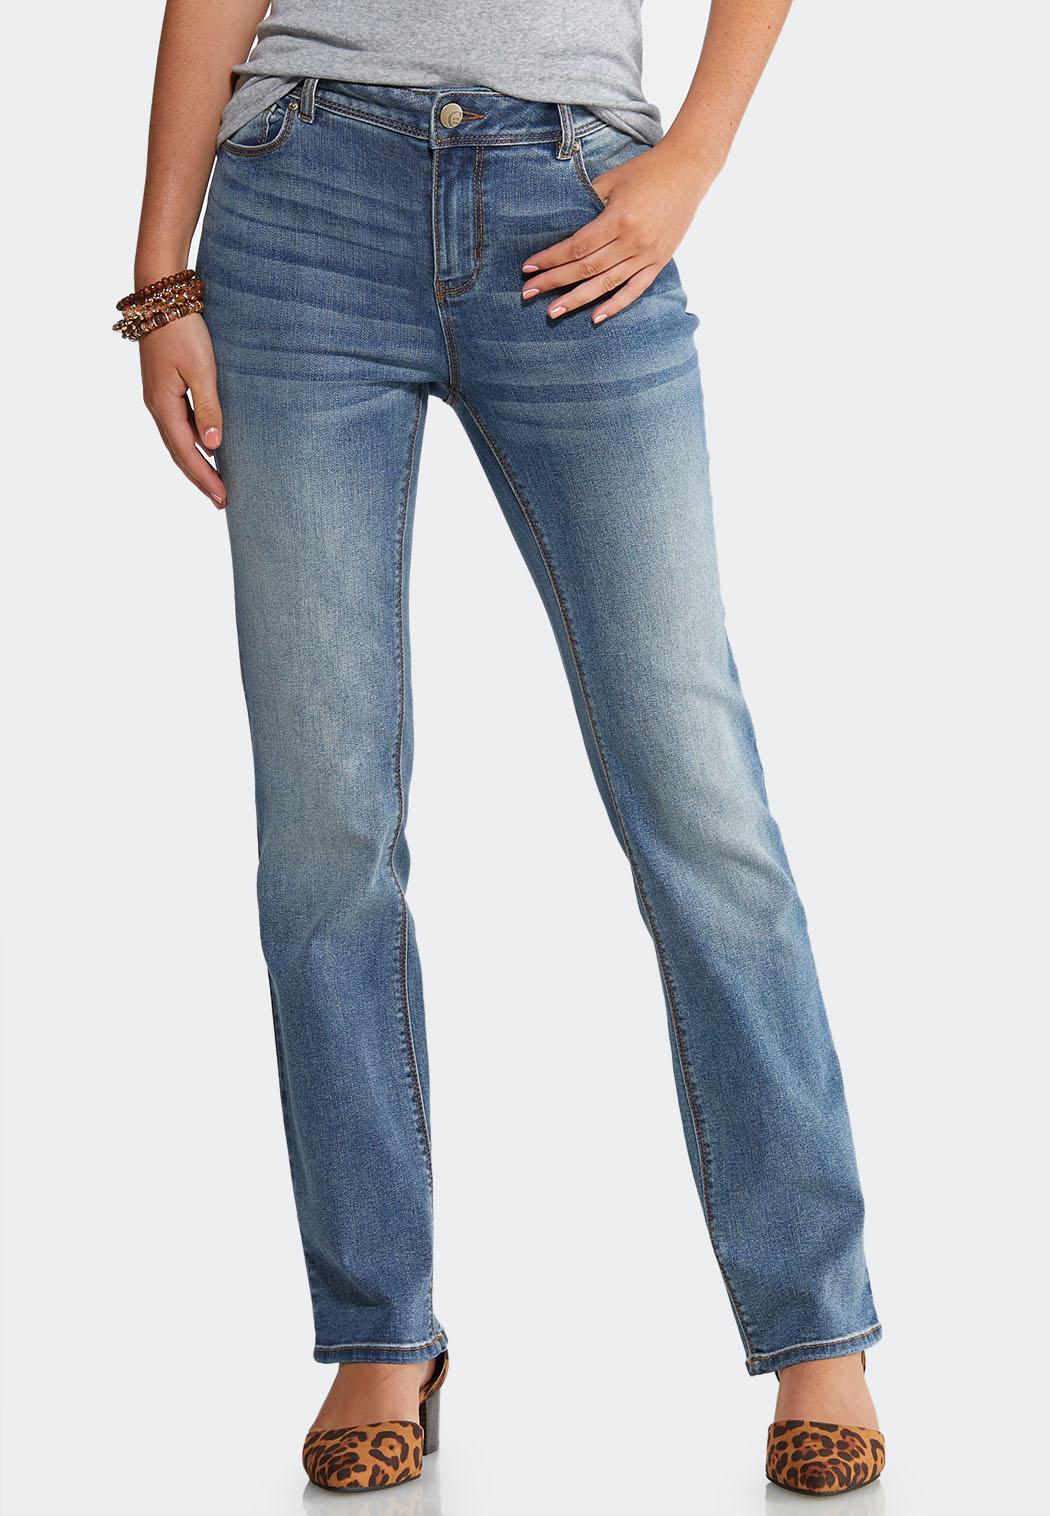 Medium Wash Straight Leg Jeans